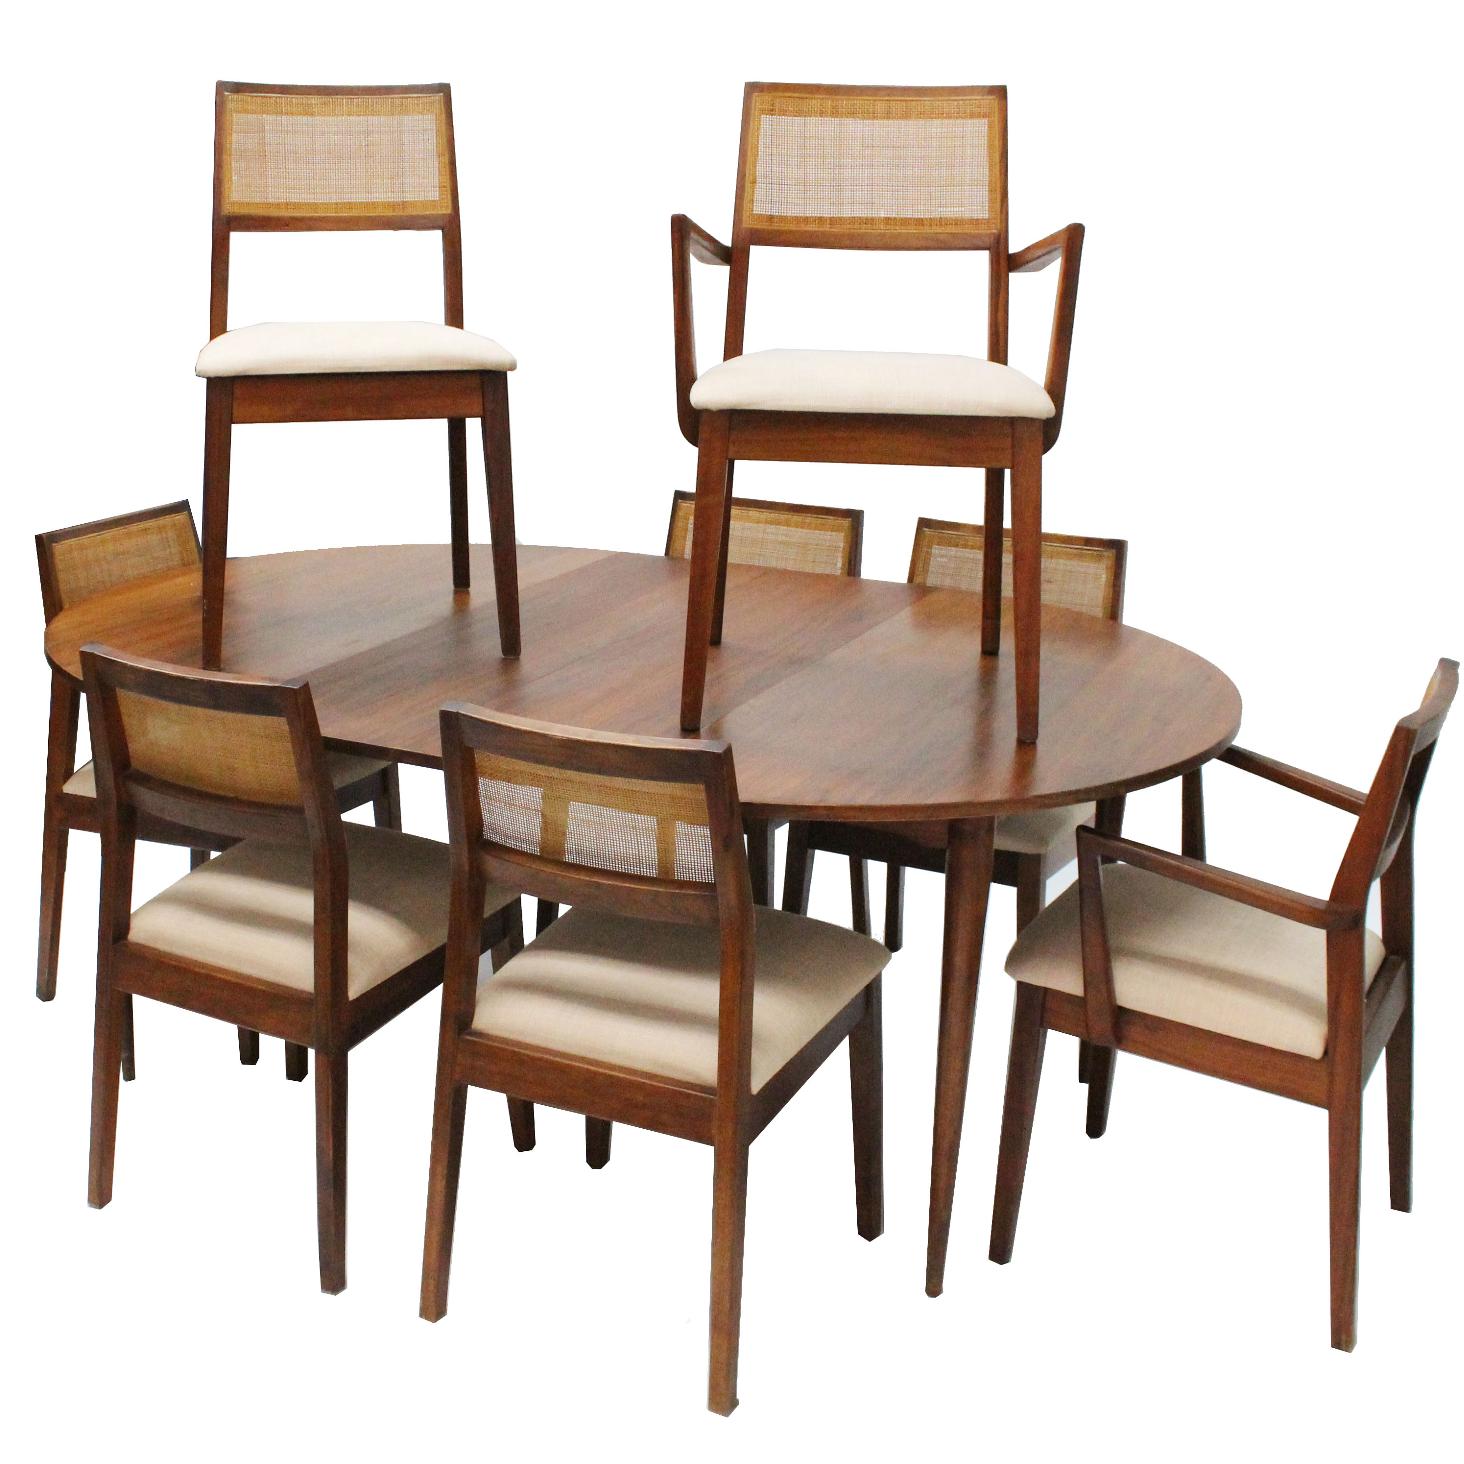 Teak Dining Room Set: Danish Teak Dining Set